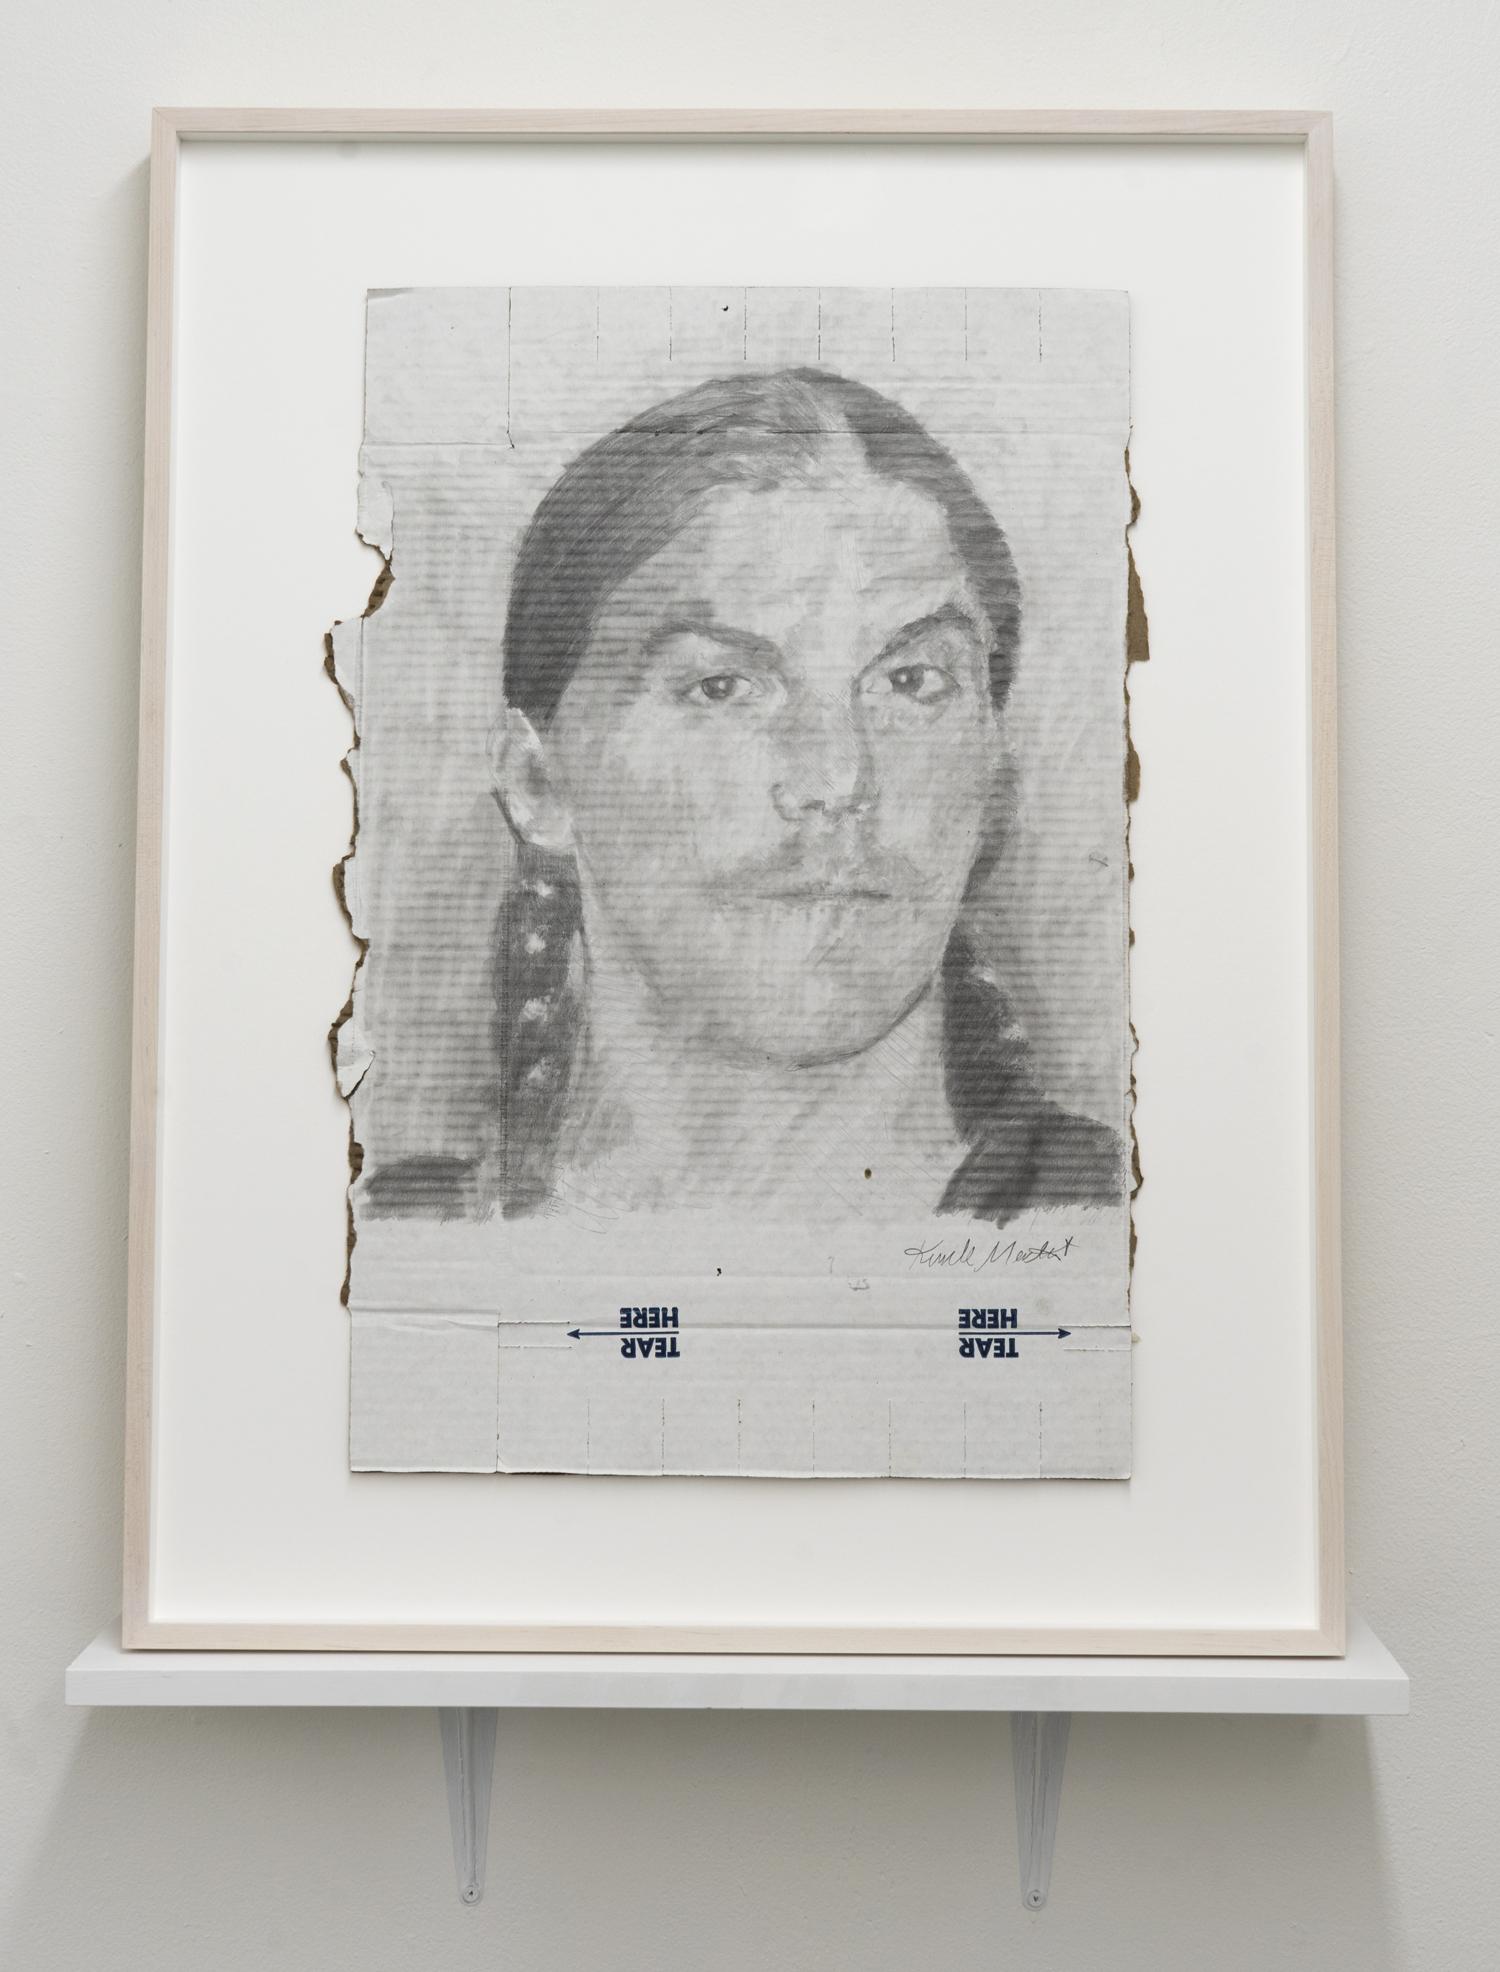 Kunle F. Martins,  Dash,  2018, pencil on found white cardboard box, 31 × 24 inches